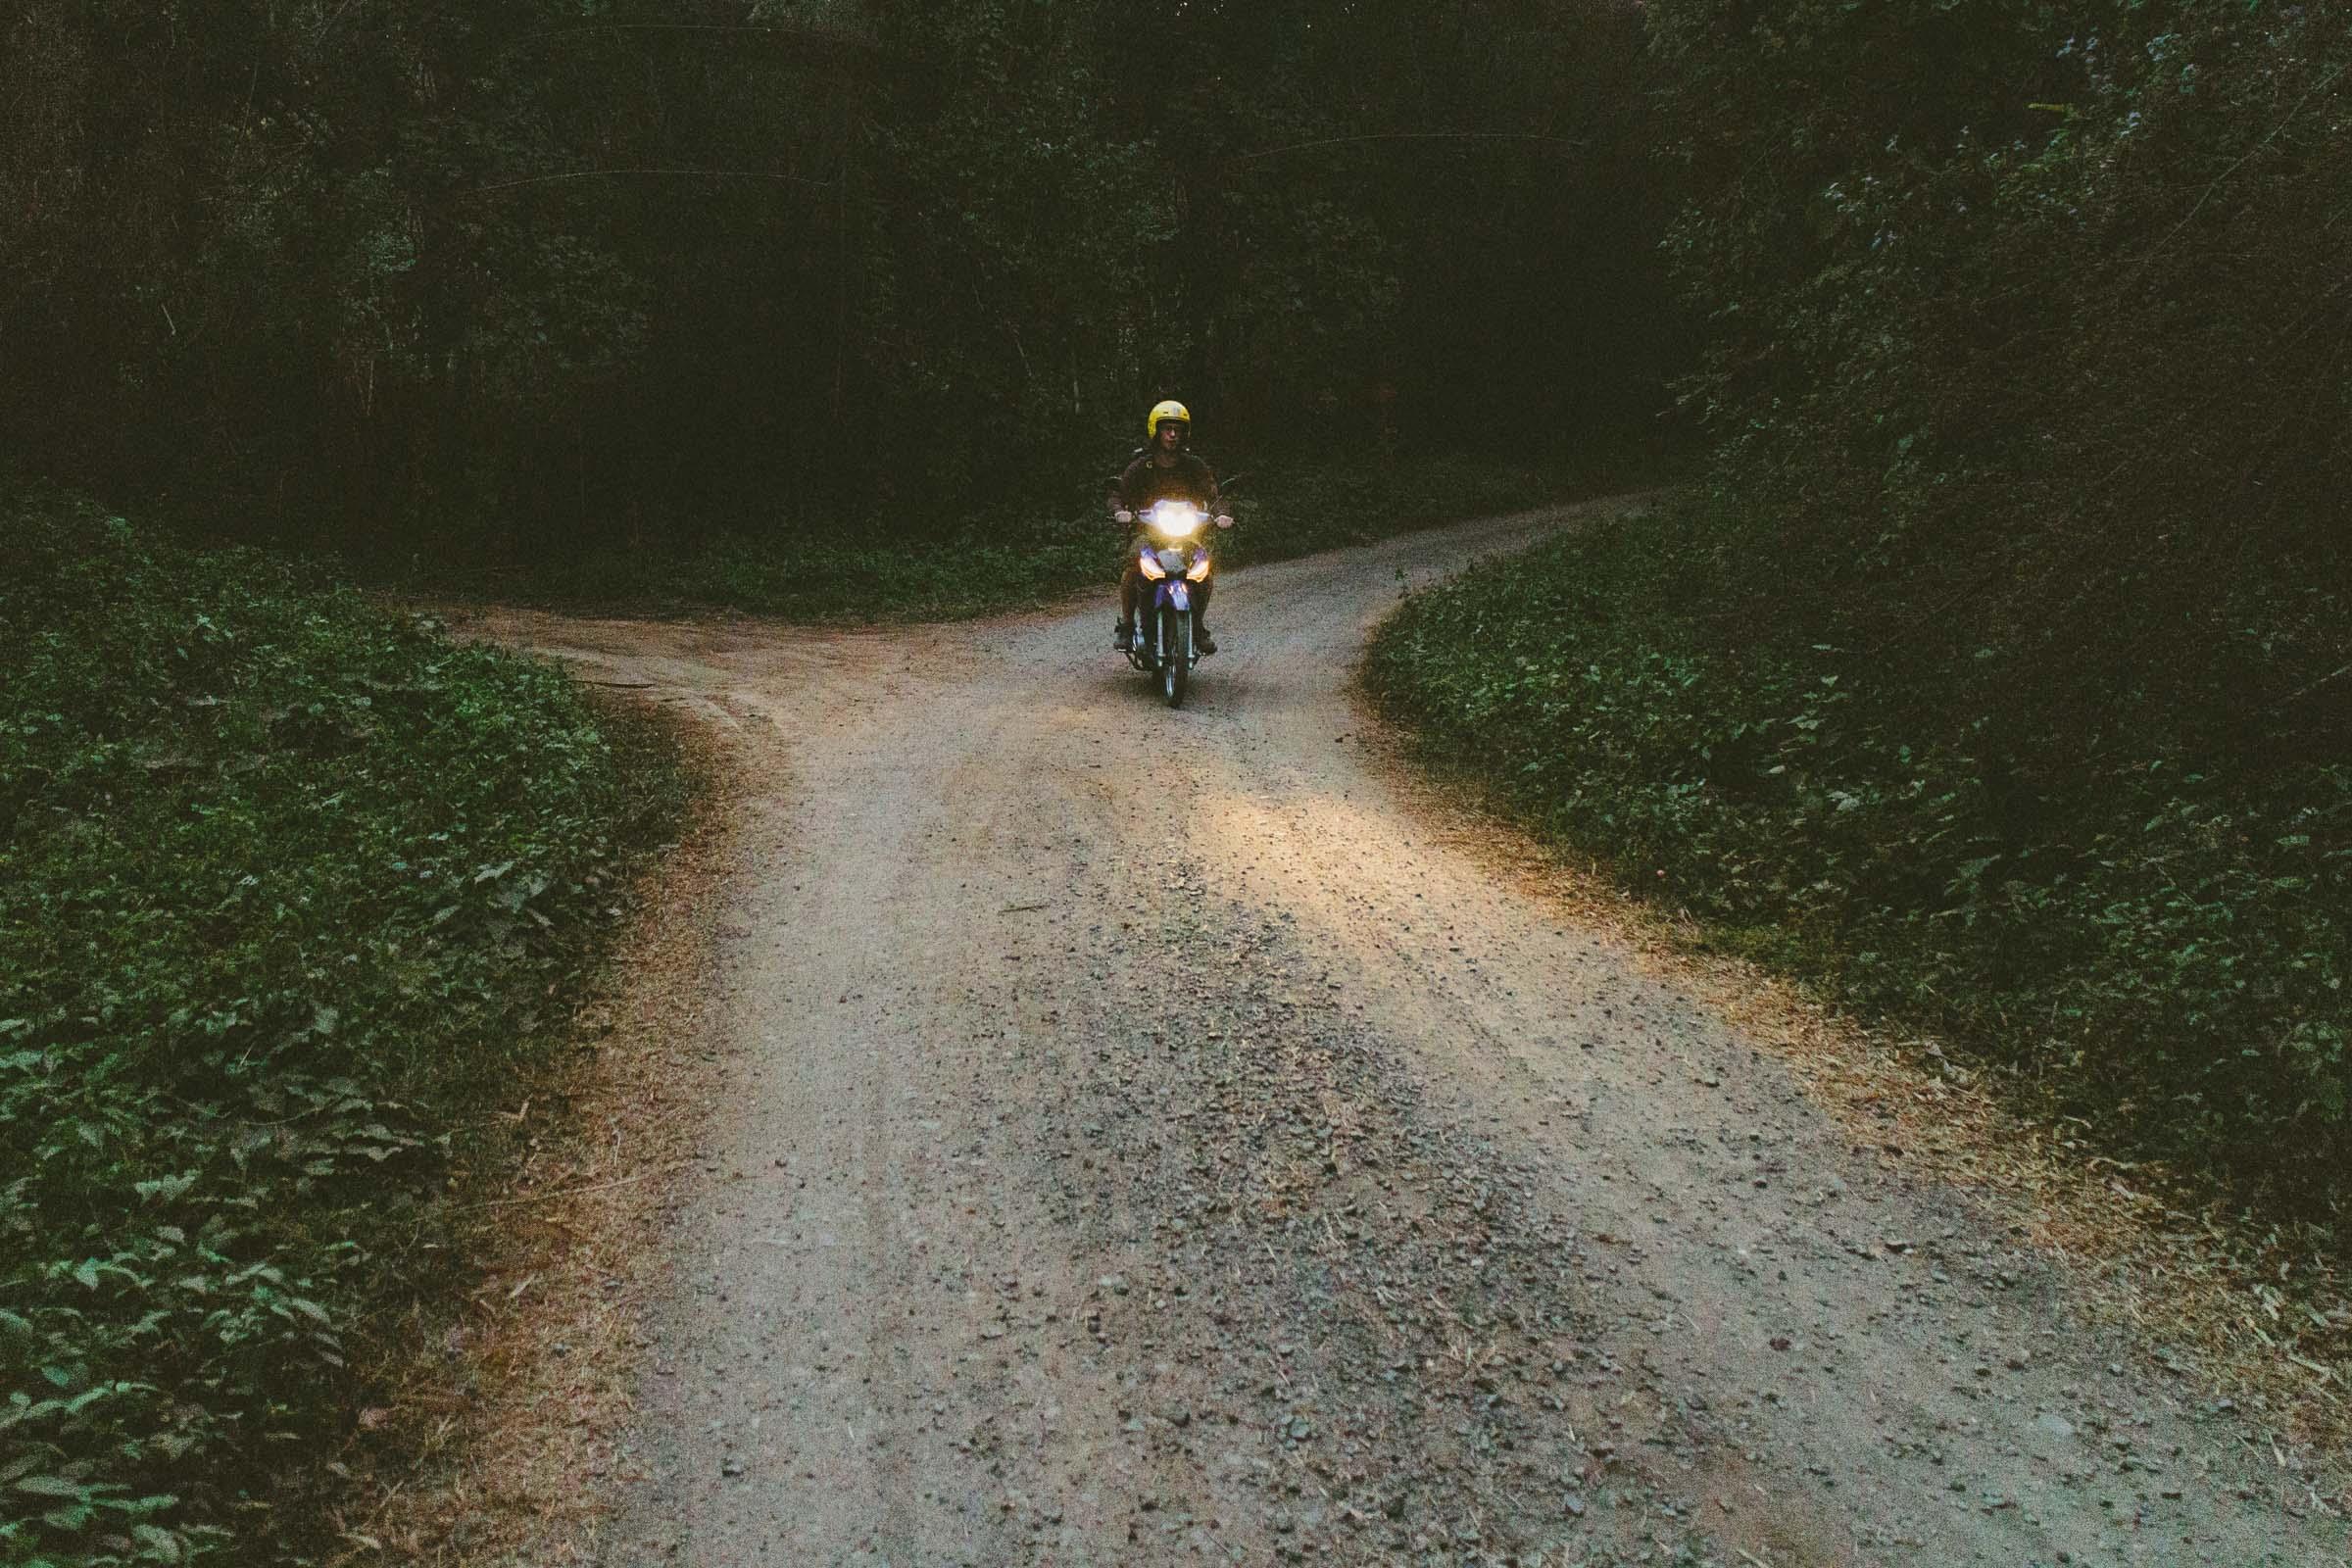 Motorcycle riding | Katch Silva